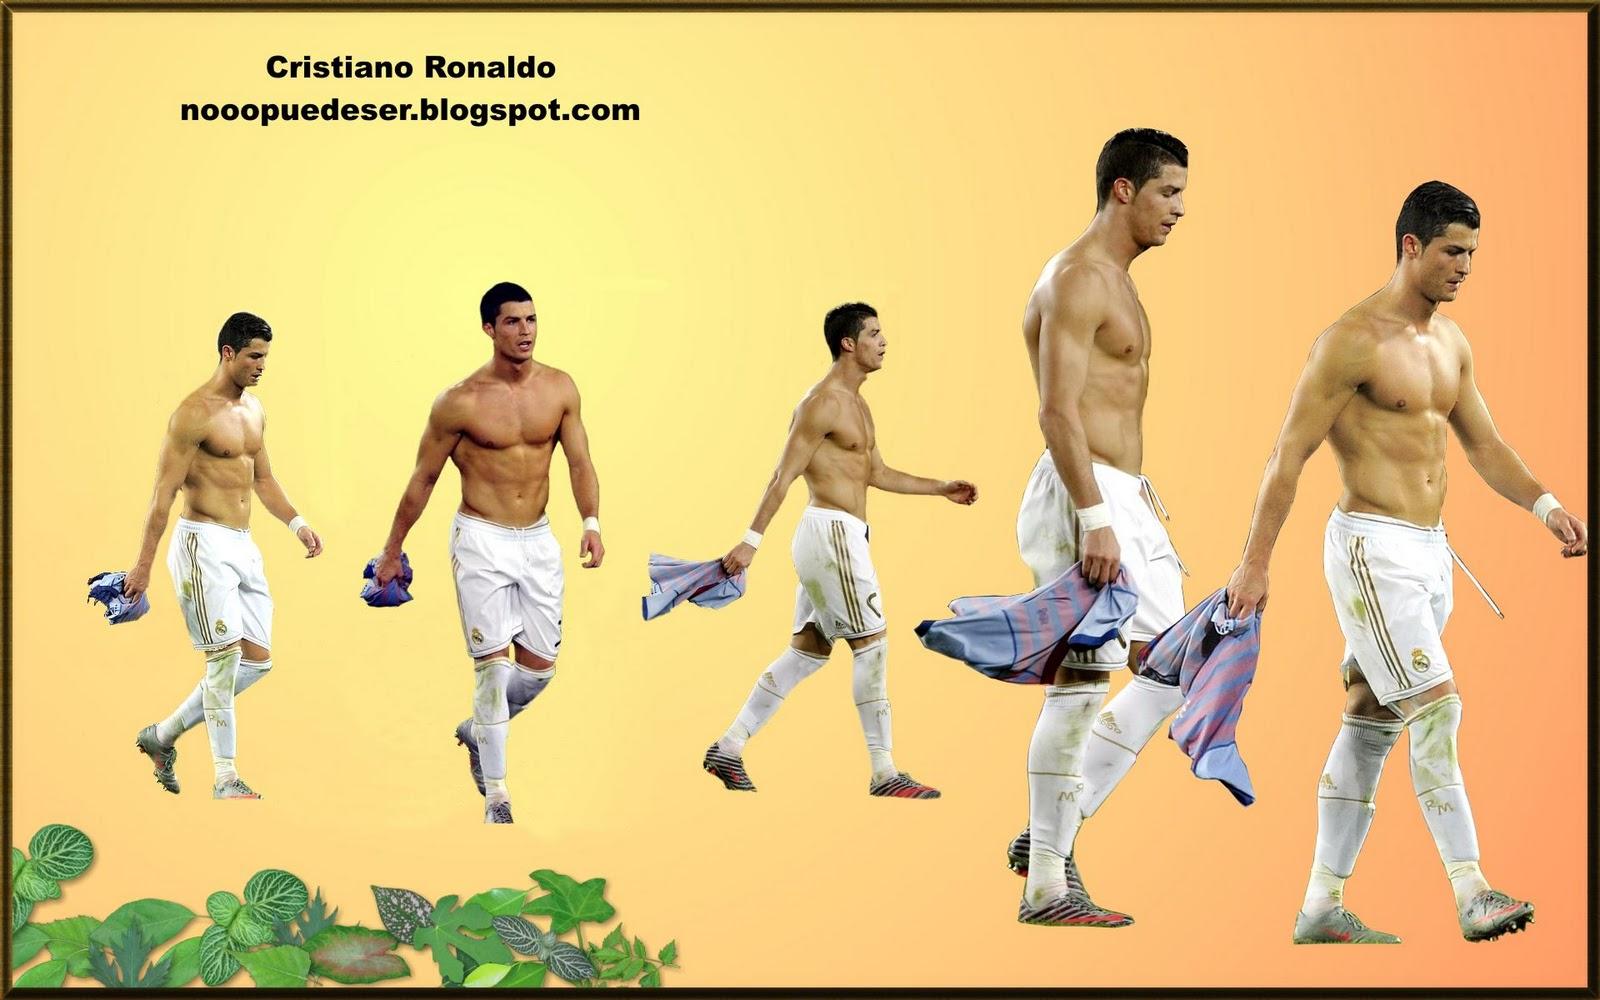 http://1.bp.blogspot.com/-ho9CVwBbJF4/TyF0_Lj50rI/AAAAAAAAIec/cnICb-UtbIA/s1600/Cristiano-Ronaldo-07.jpg